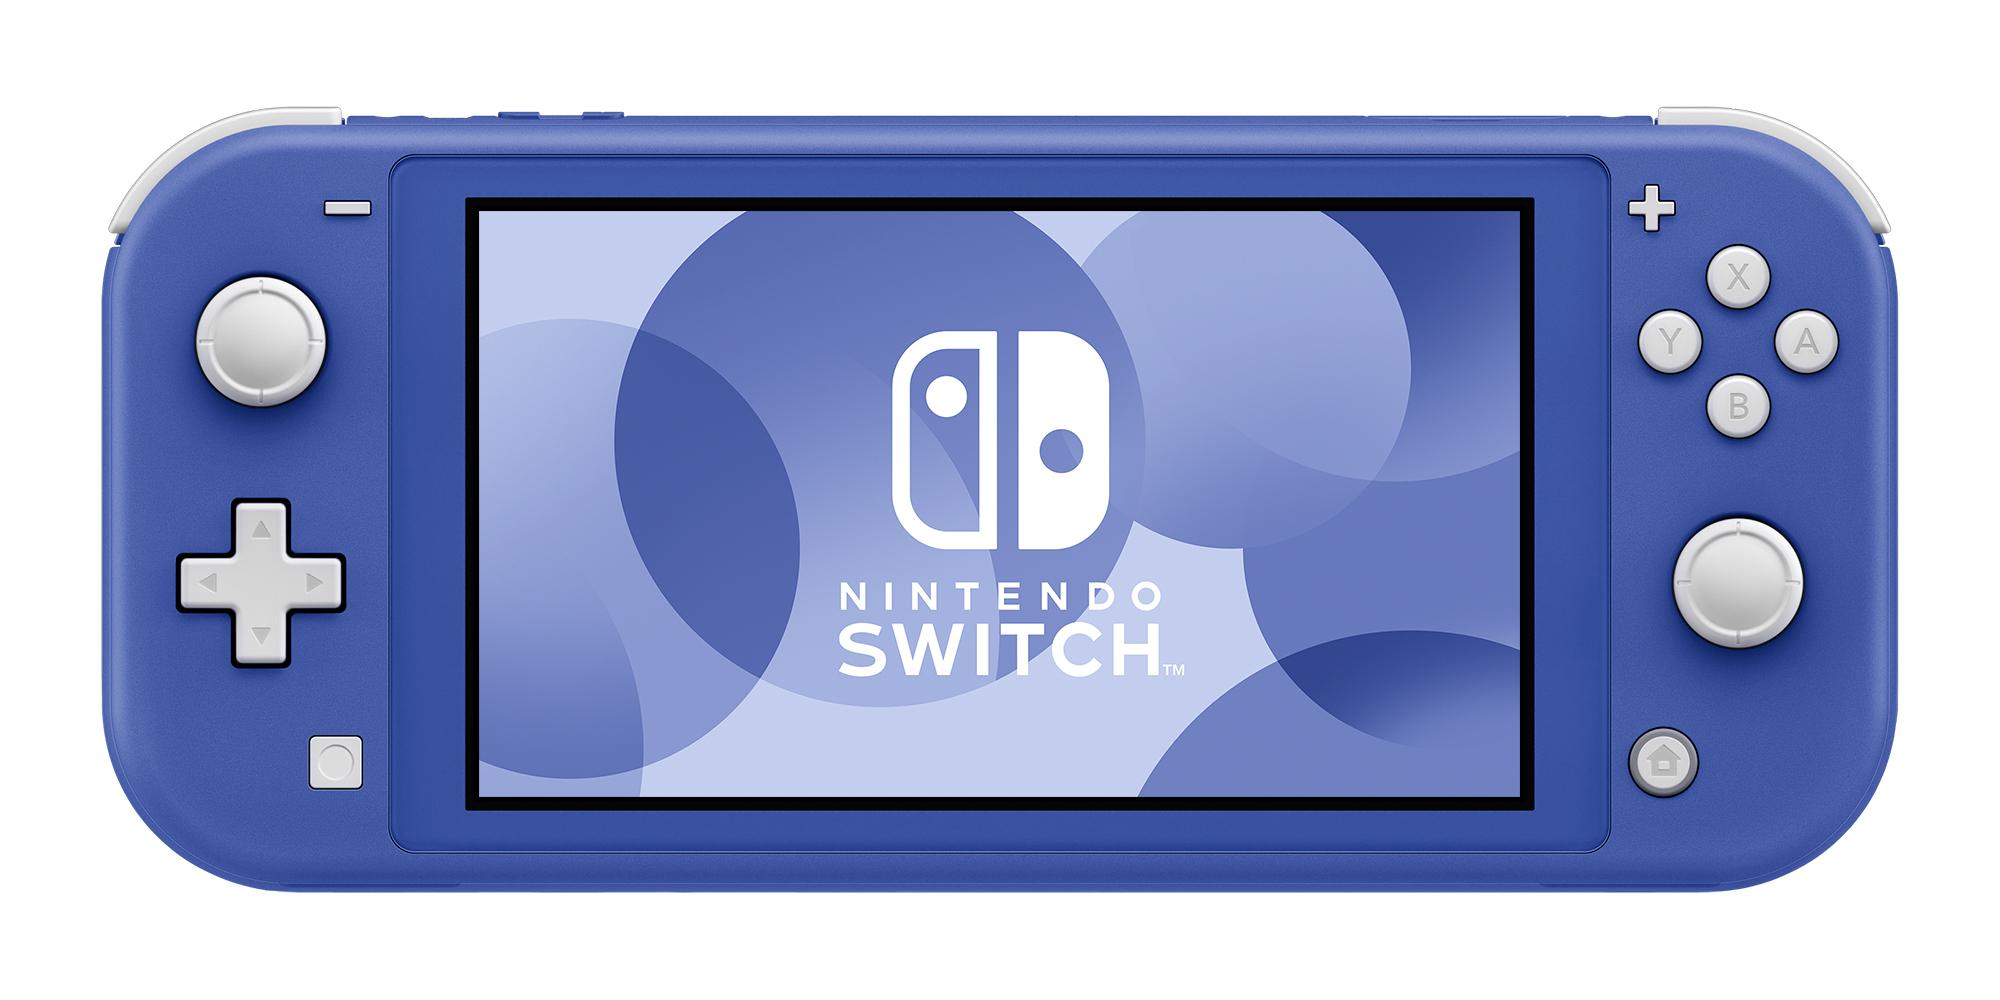 NintendoSwitchLiteBlue_3.jpg